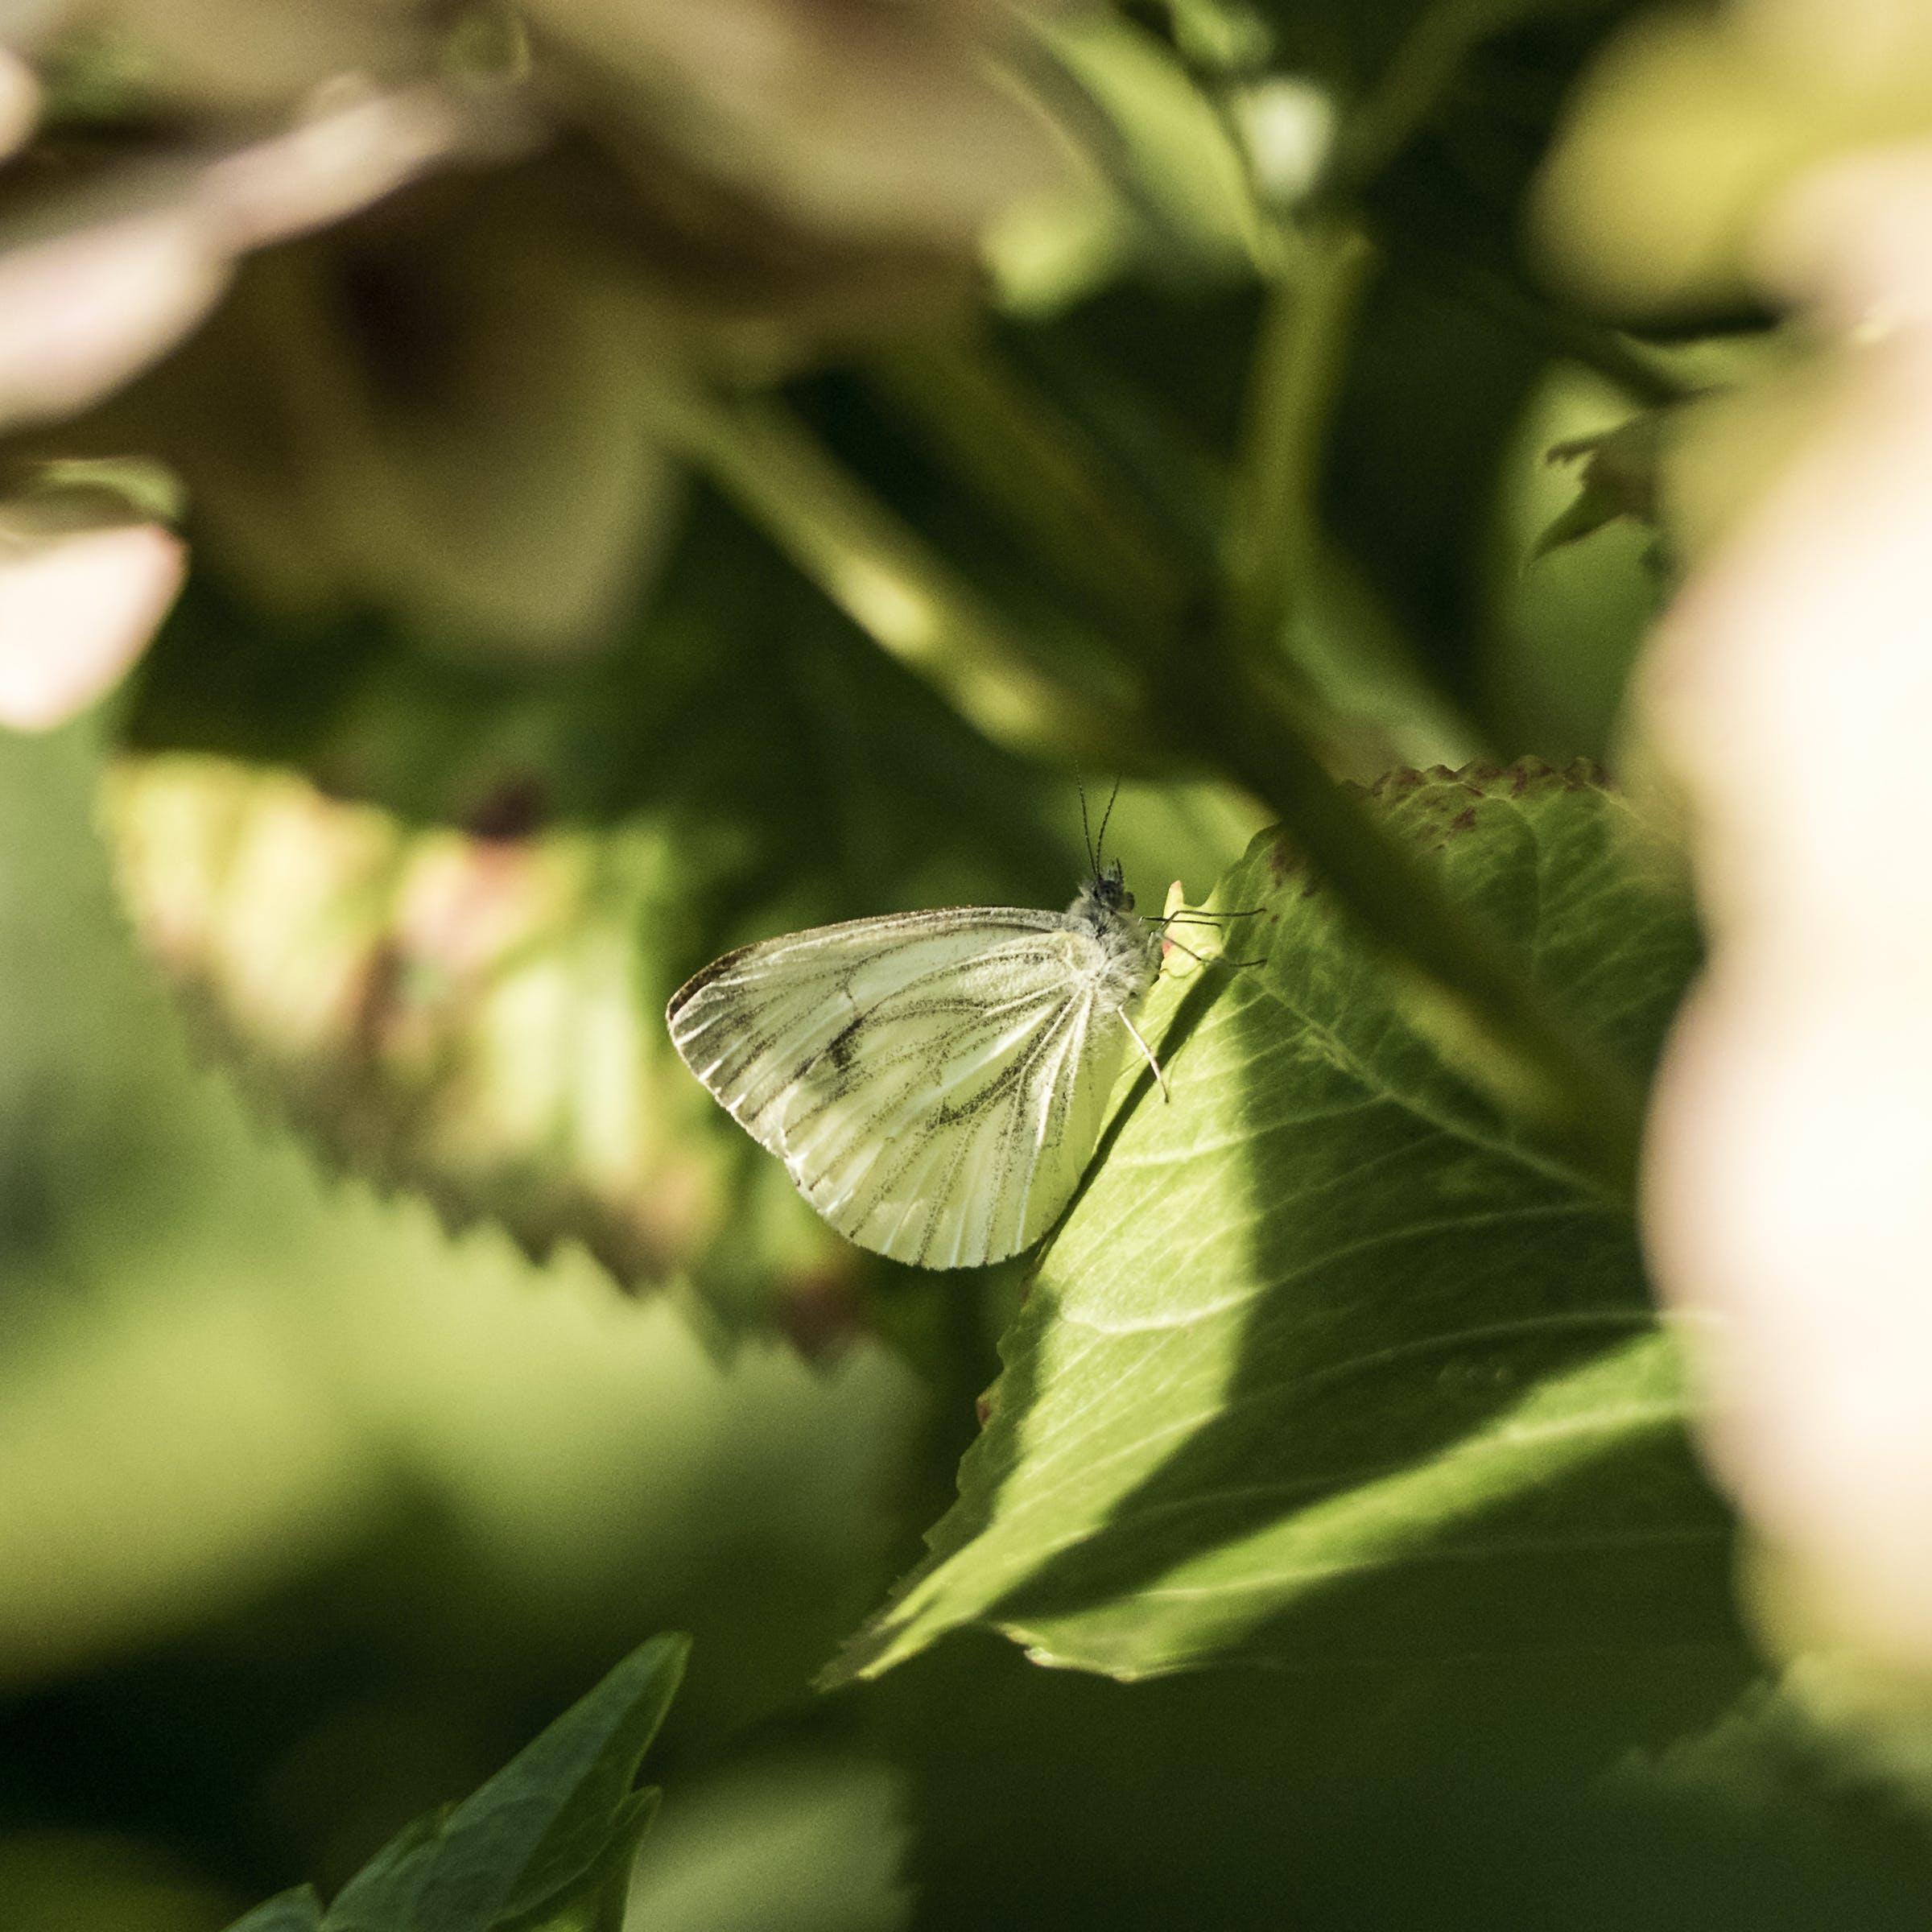 Gratis lagerfoto af hvid sommerfugl, sommerfugl